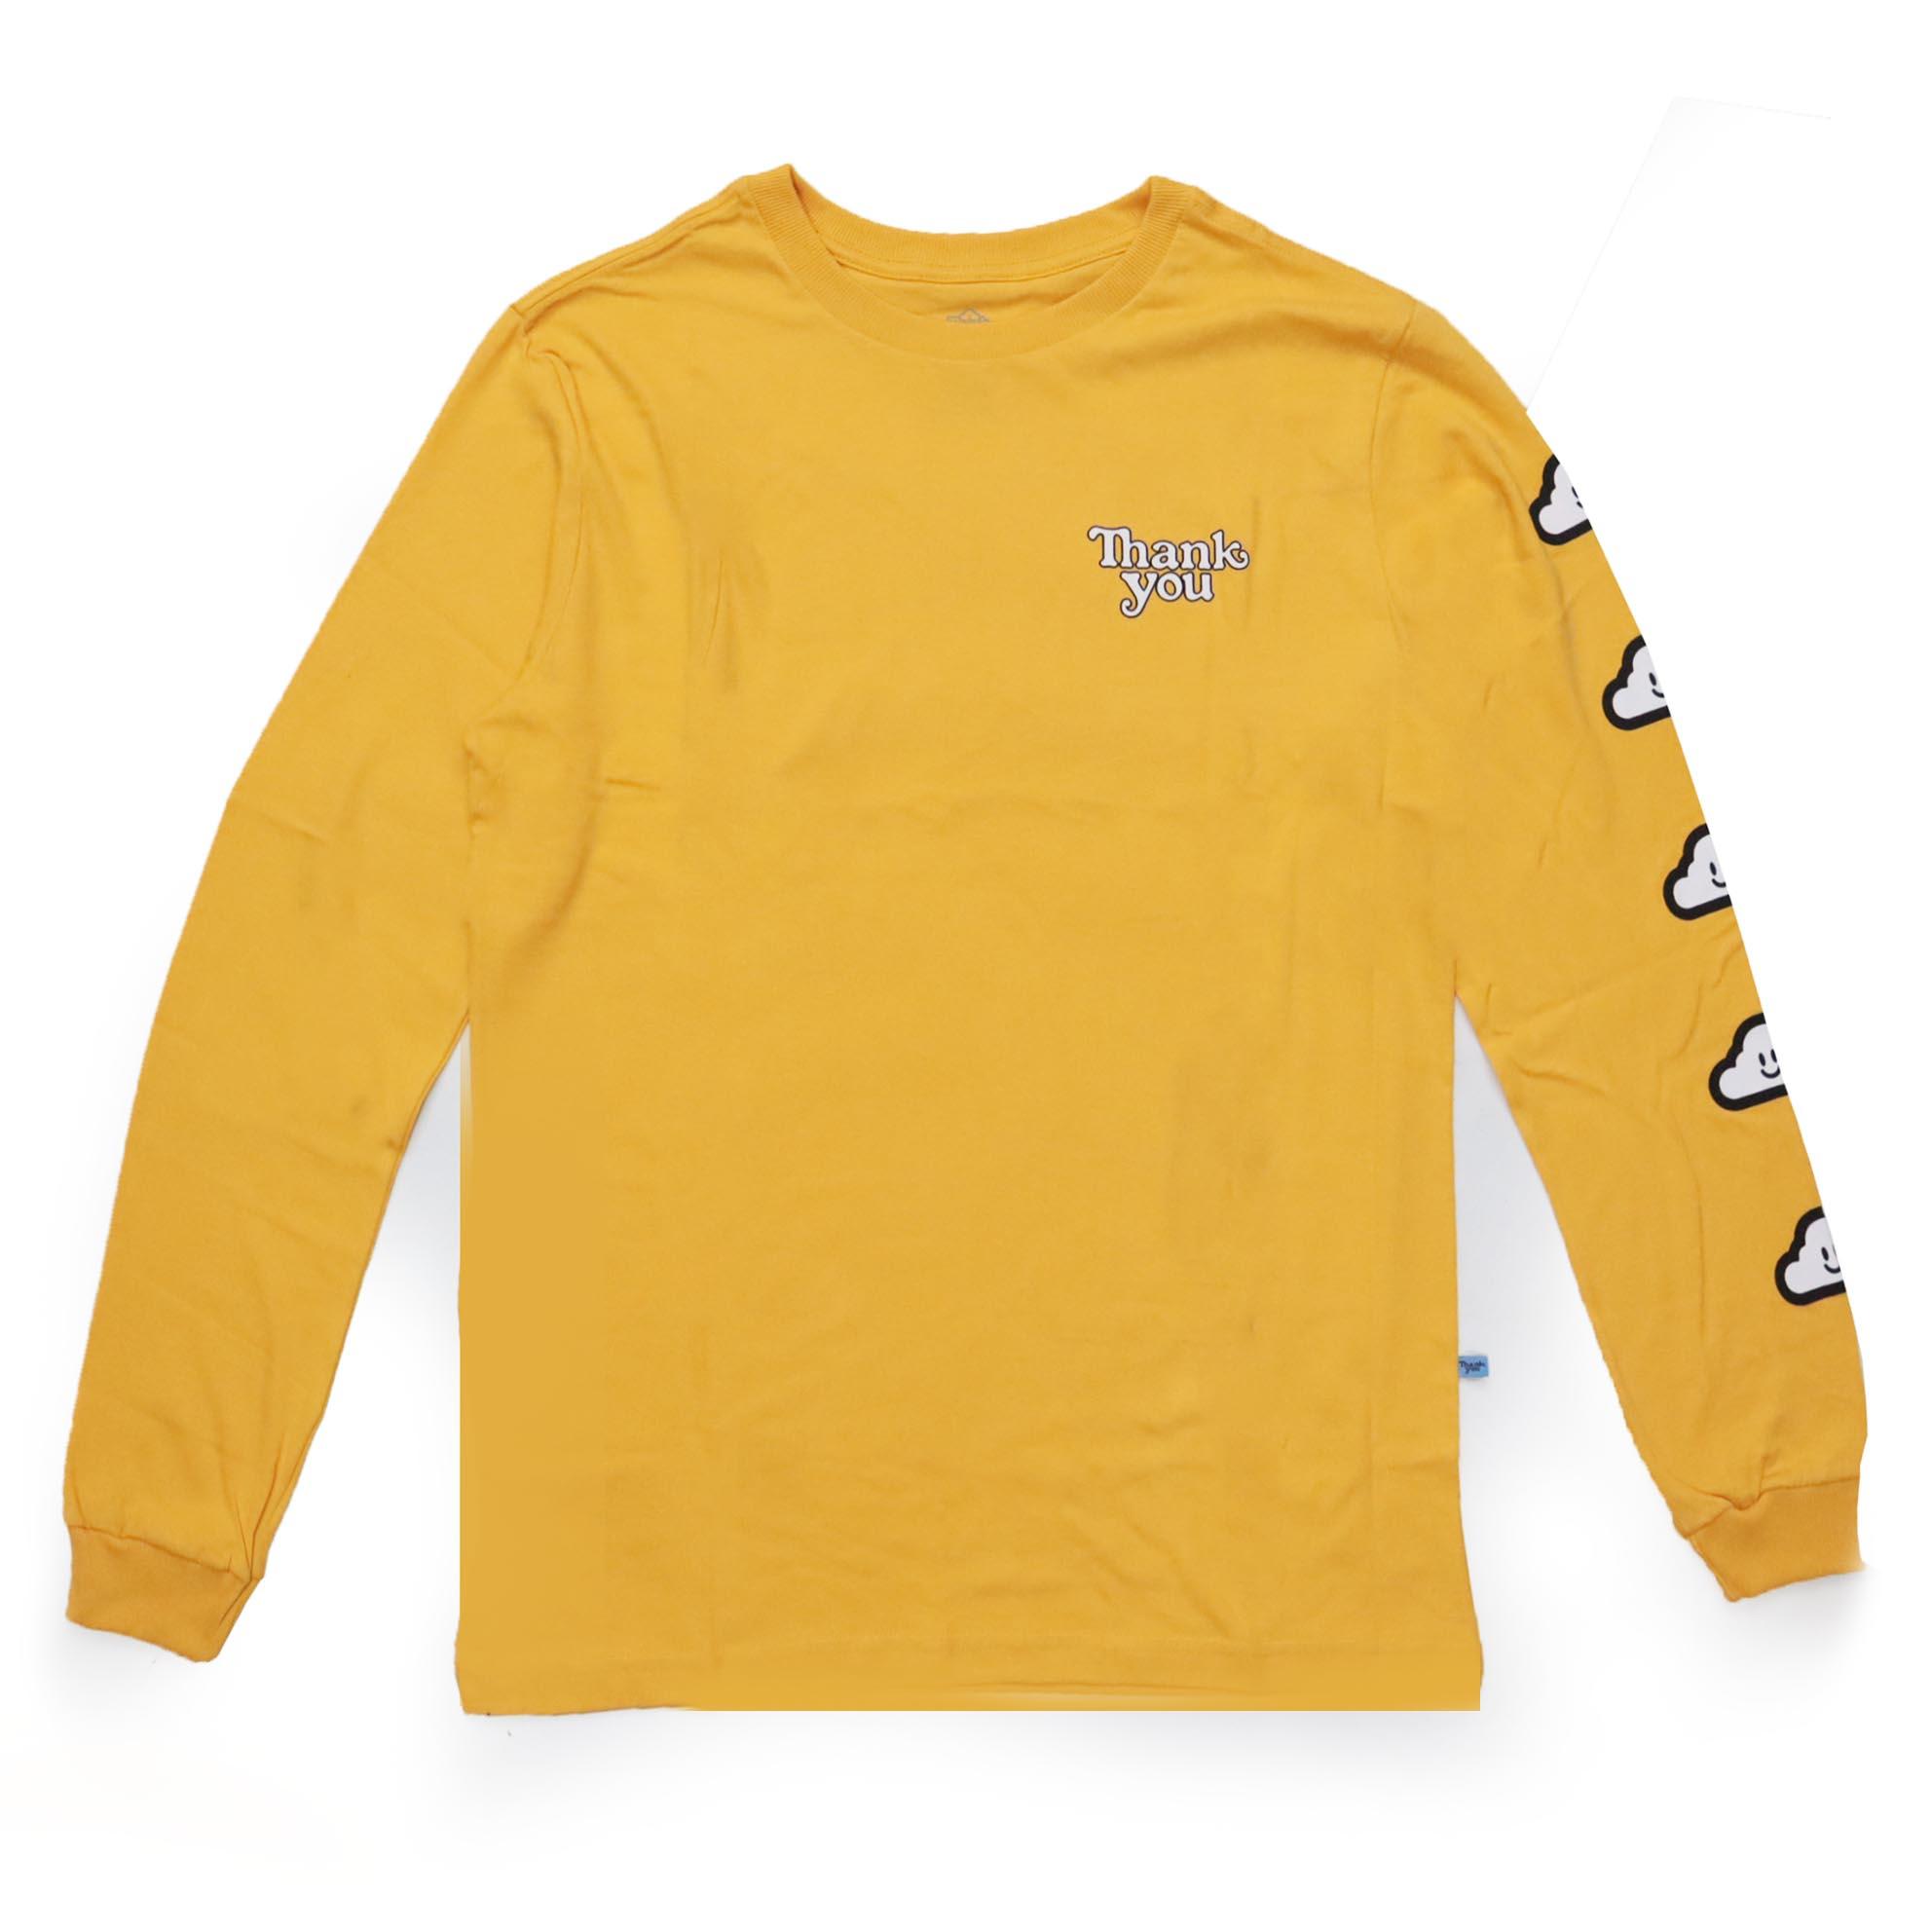 Camiseta Manga Longa Thank You Cloud - Amarelo Gold